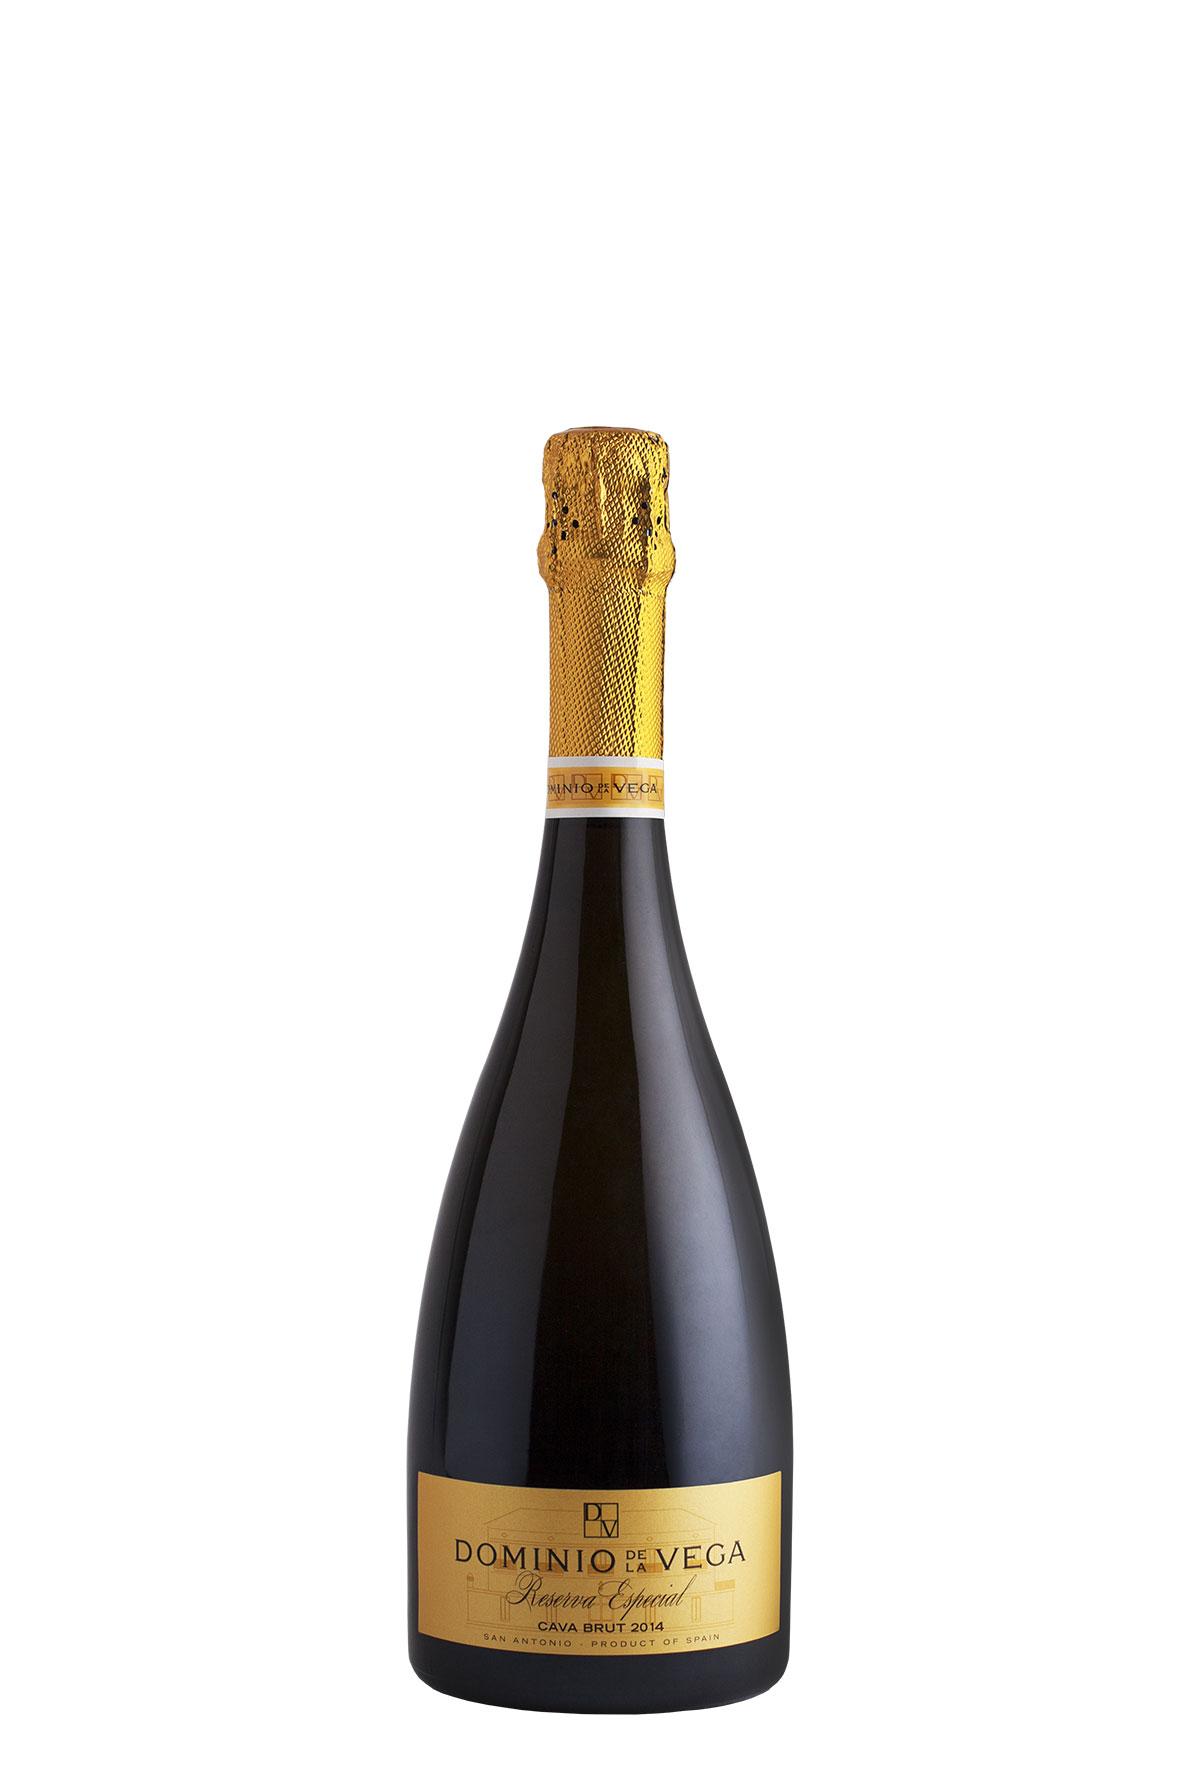 Botella 75cl. Cava brut reserva especial 2014